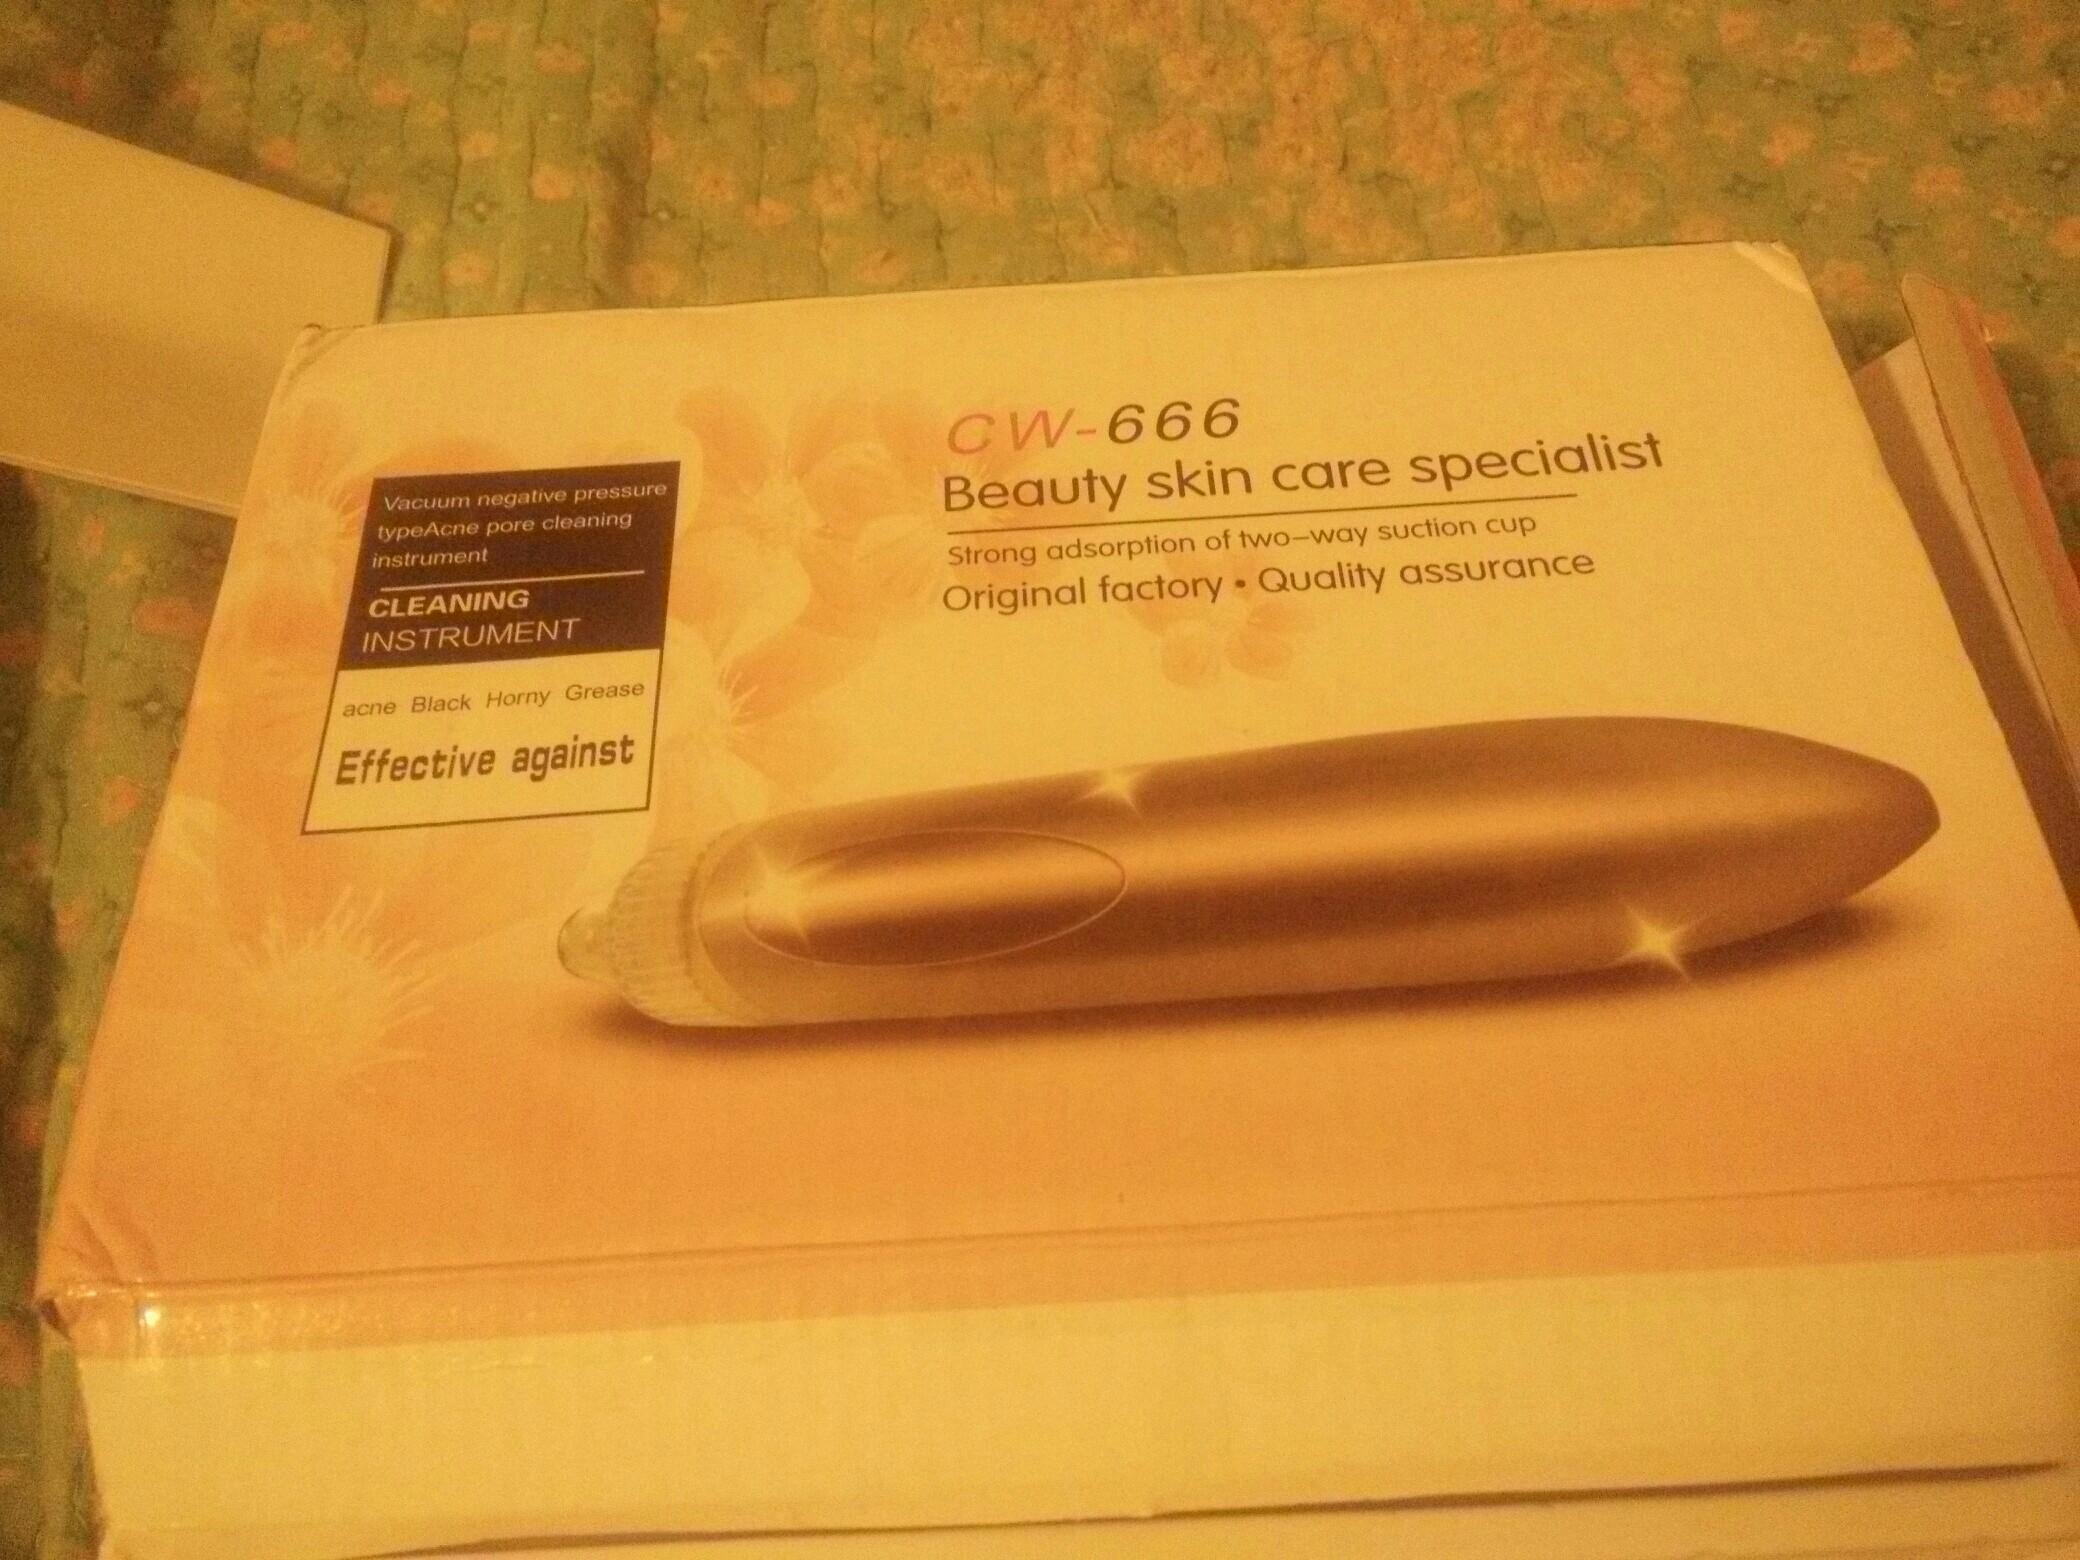 Beauty Skin Carevacum Remove Blackhead Produk Badan Dan Cw 666 Black Head Removal Kecantikan Lain Di Carousell